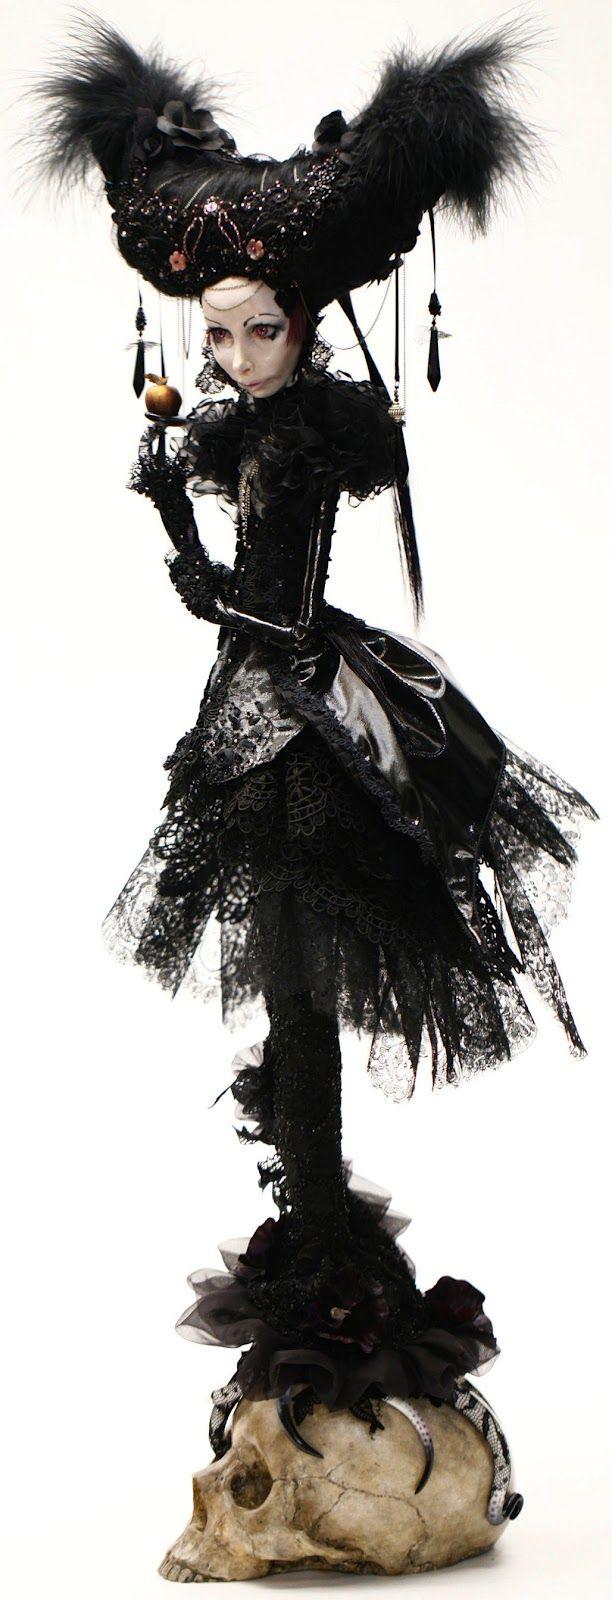 Evelyne Politanoff: 'Flawless' - The Enchanting World of Dolls